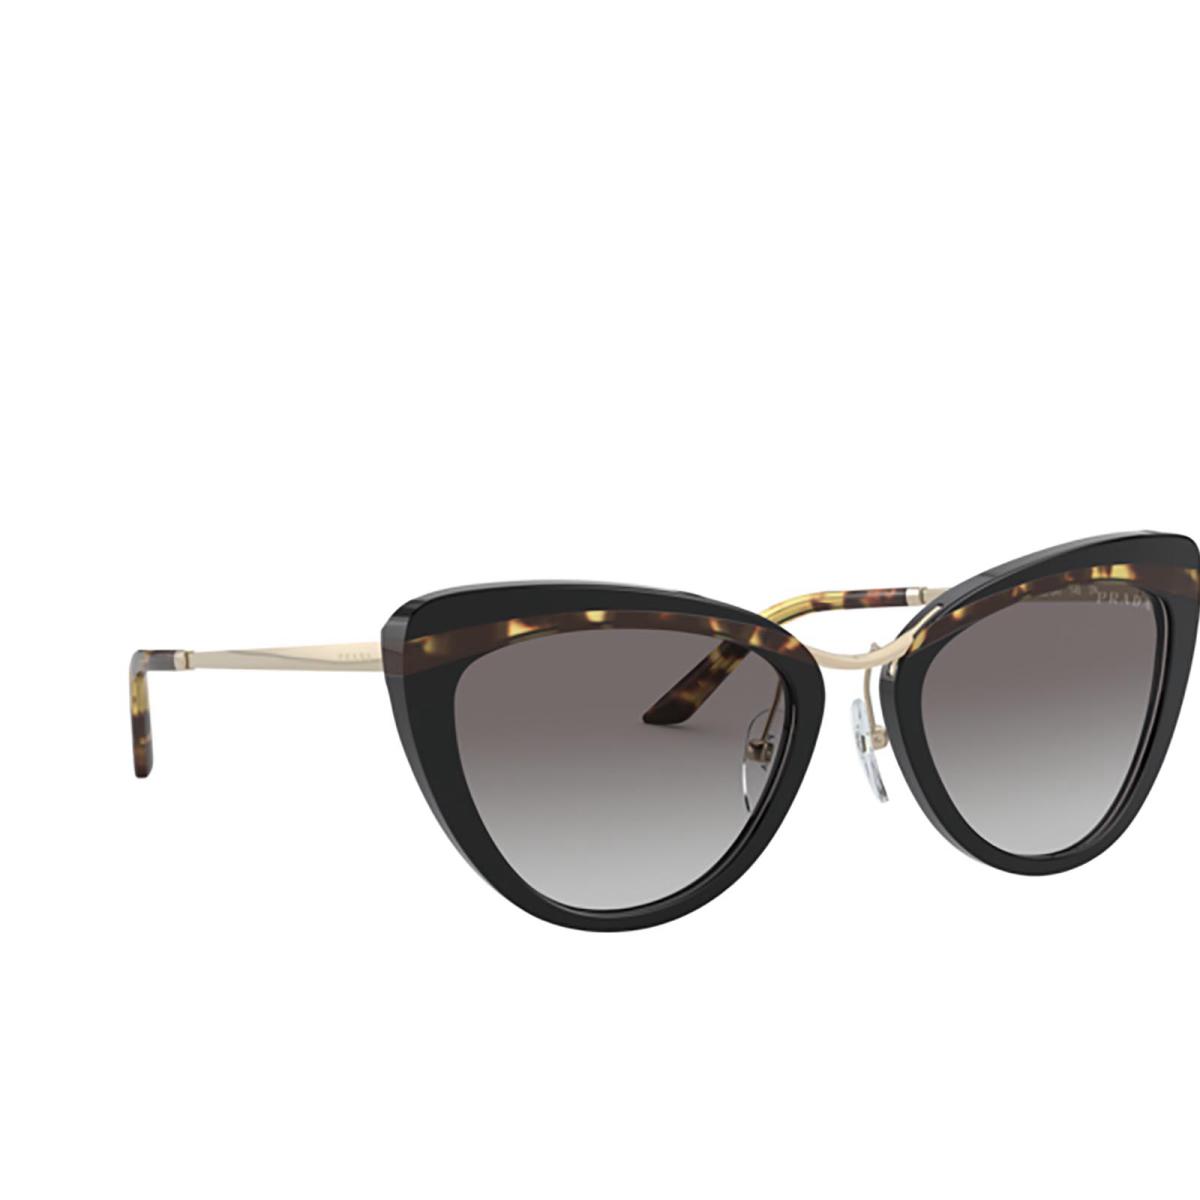 Prada® Round Sunglasses: PR 25XS color Black / Havana / Black 3890A7.